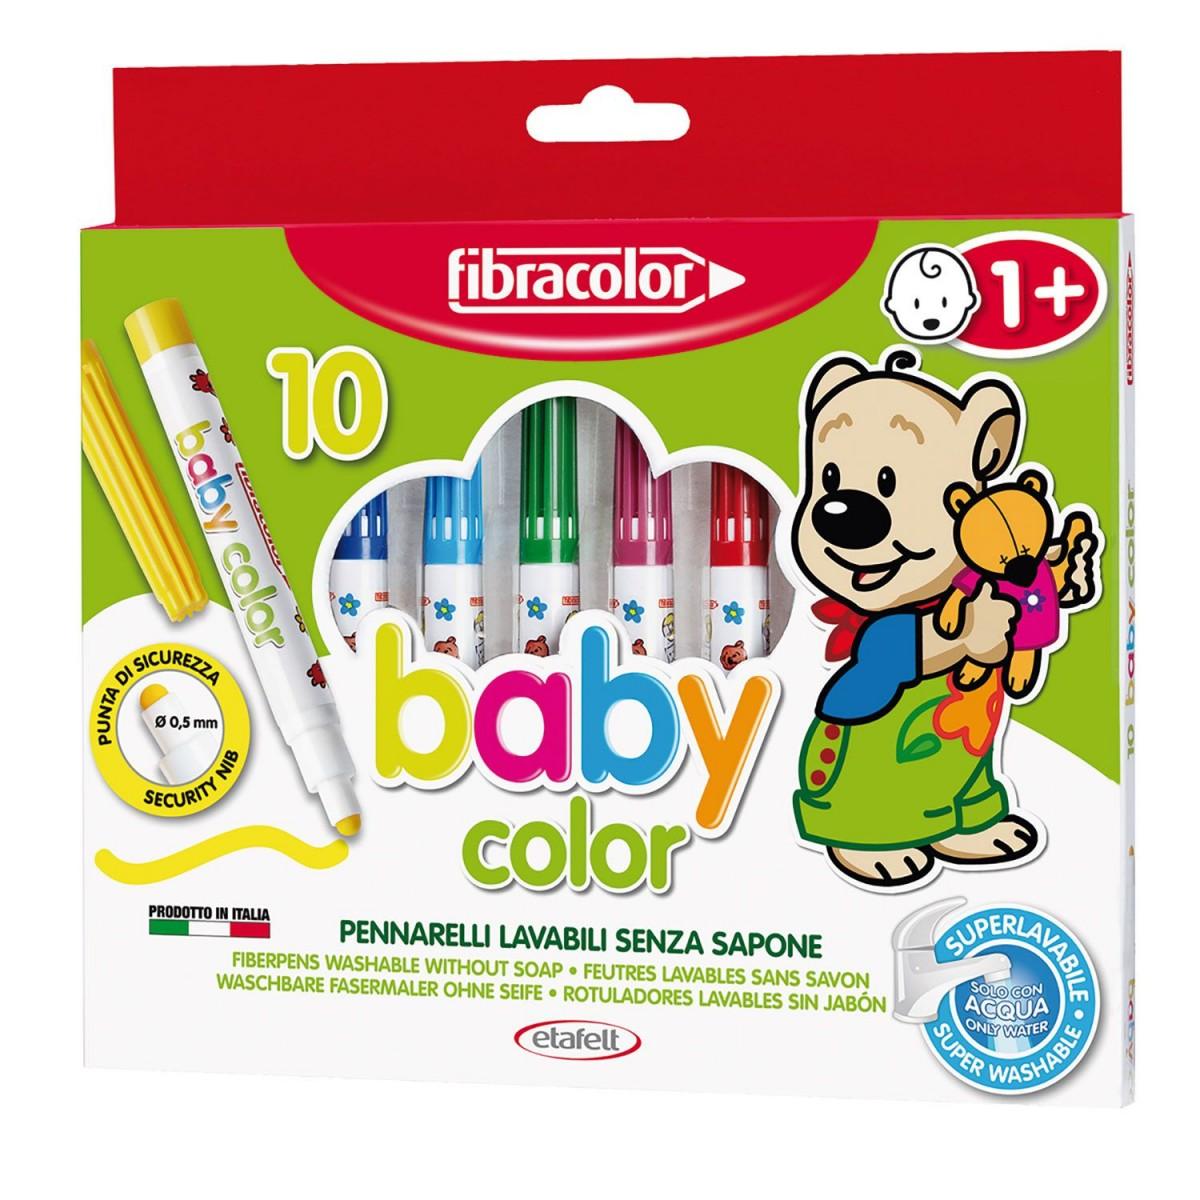 Fibracolor Μαρκαδόροι Baby 1+ (10 Τεμ.)